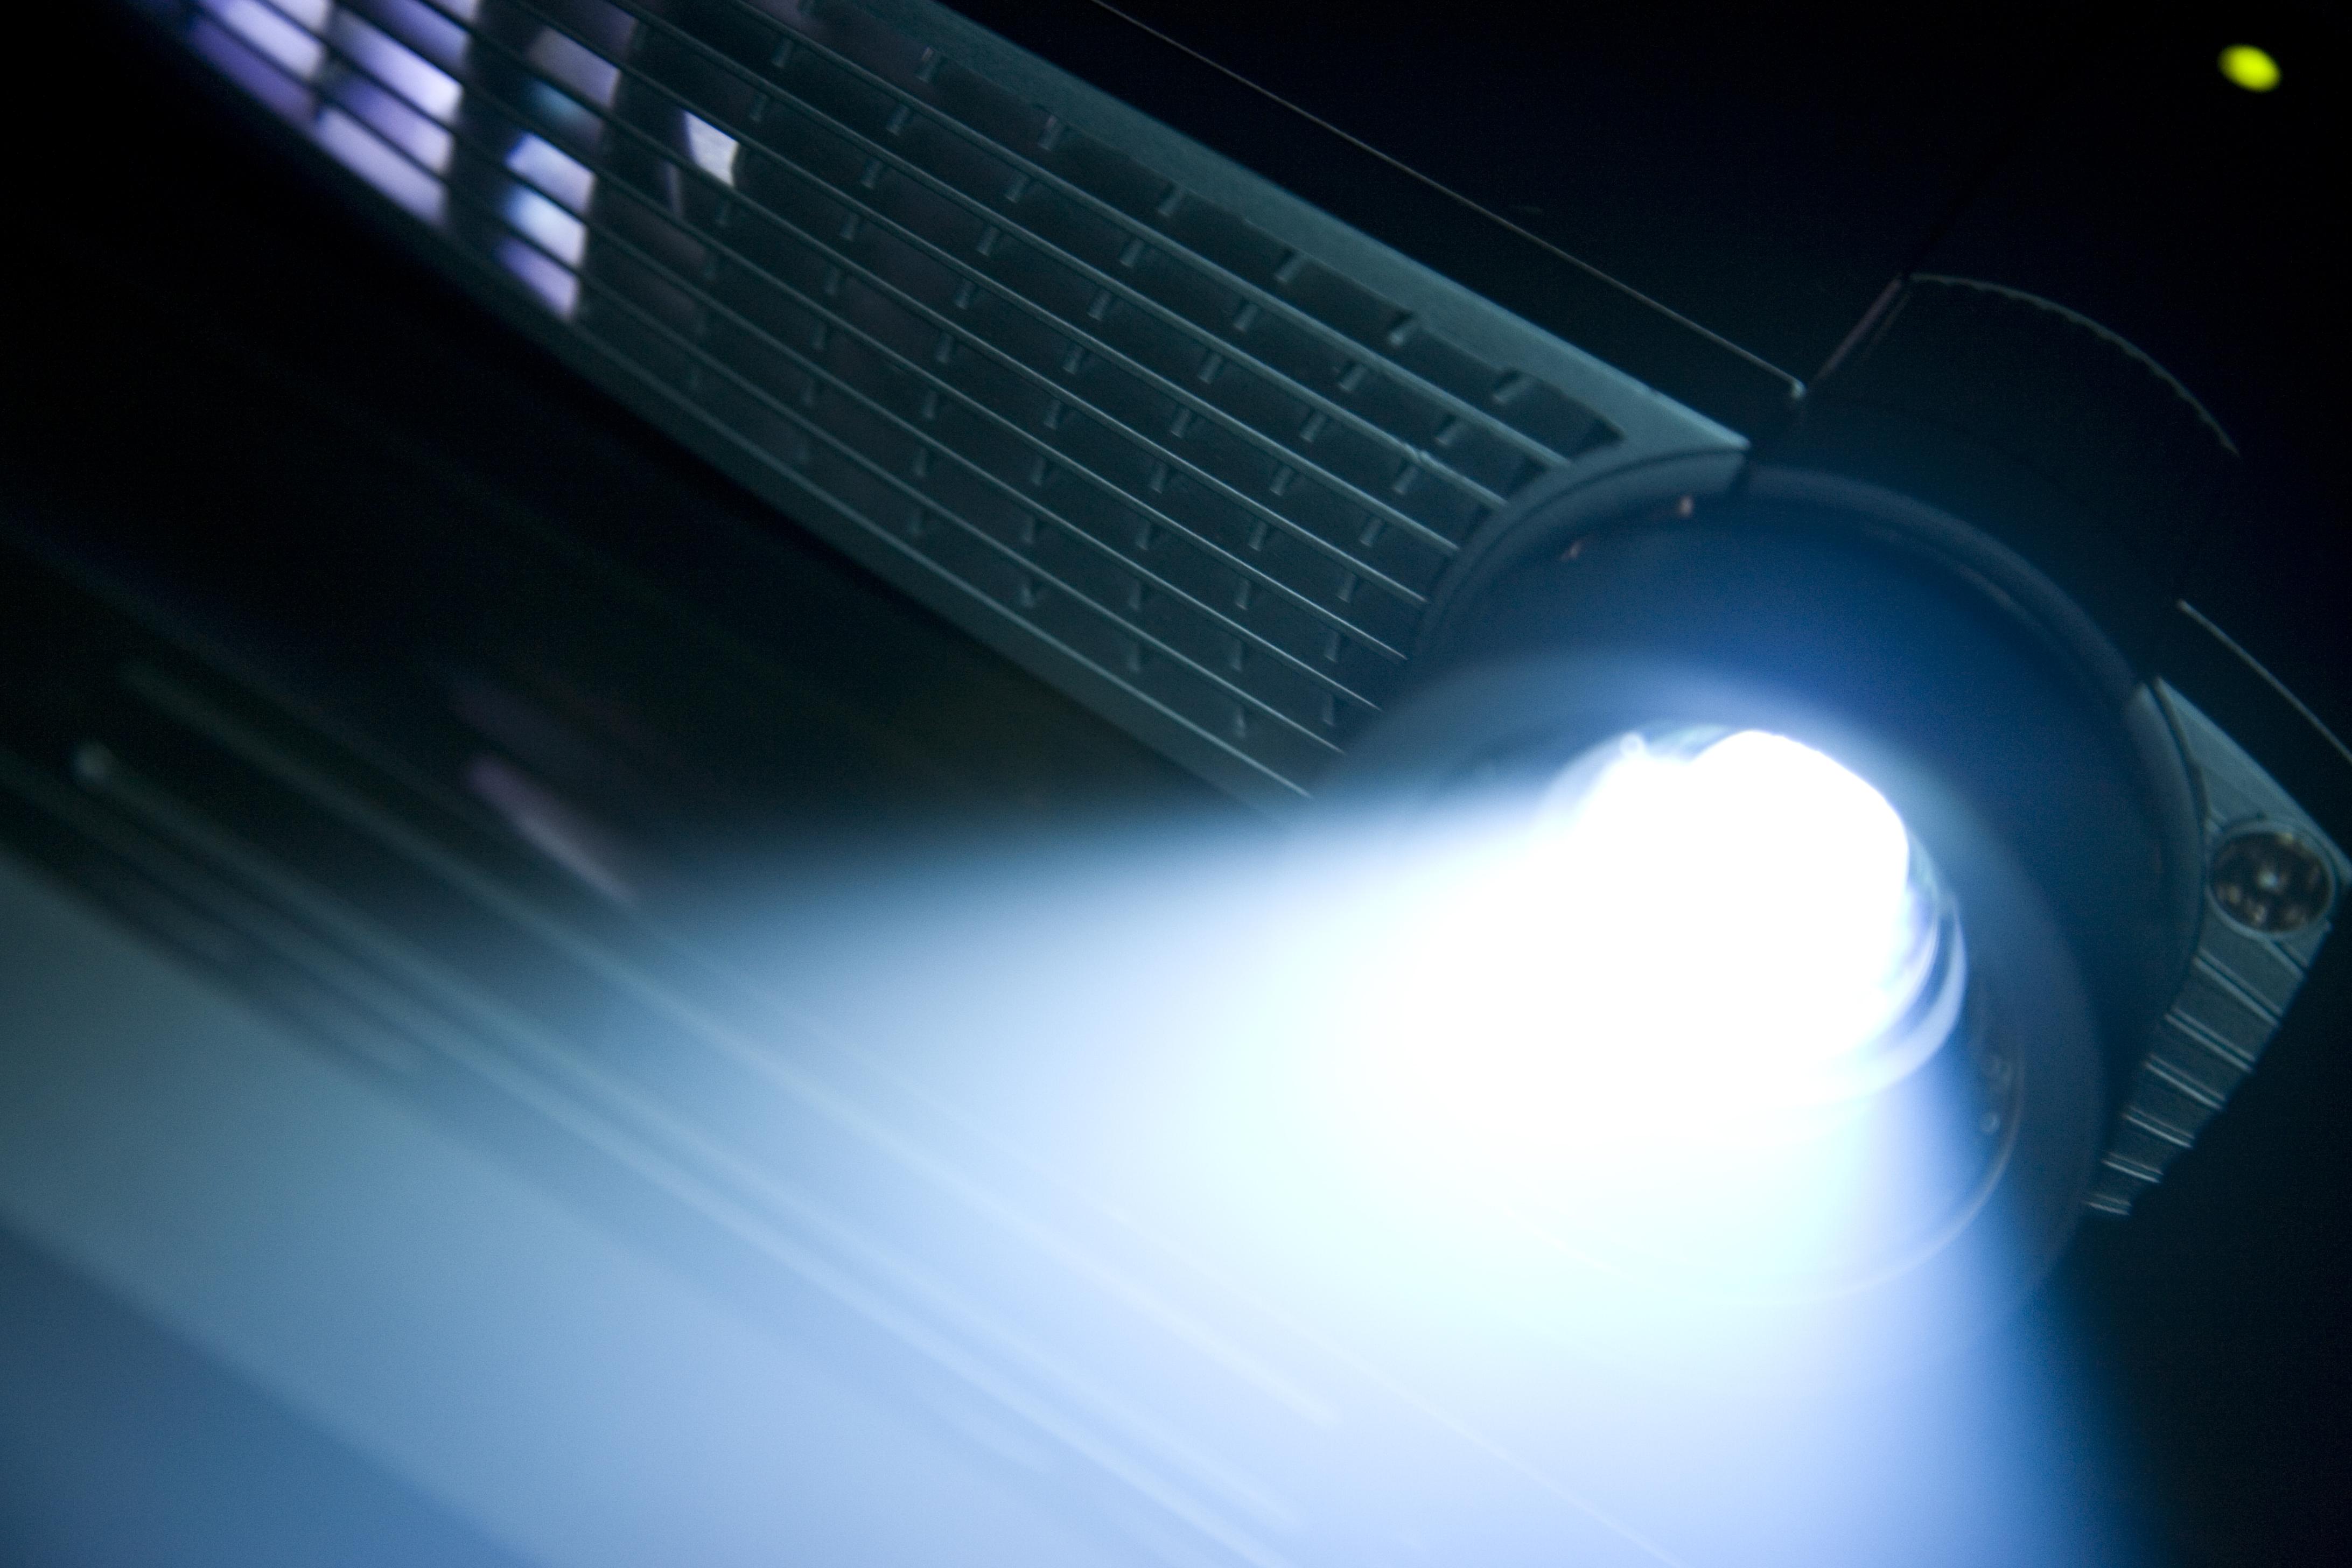 A digital projector's light shines